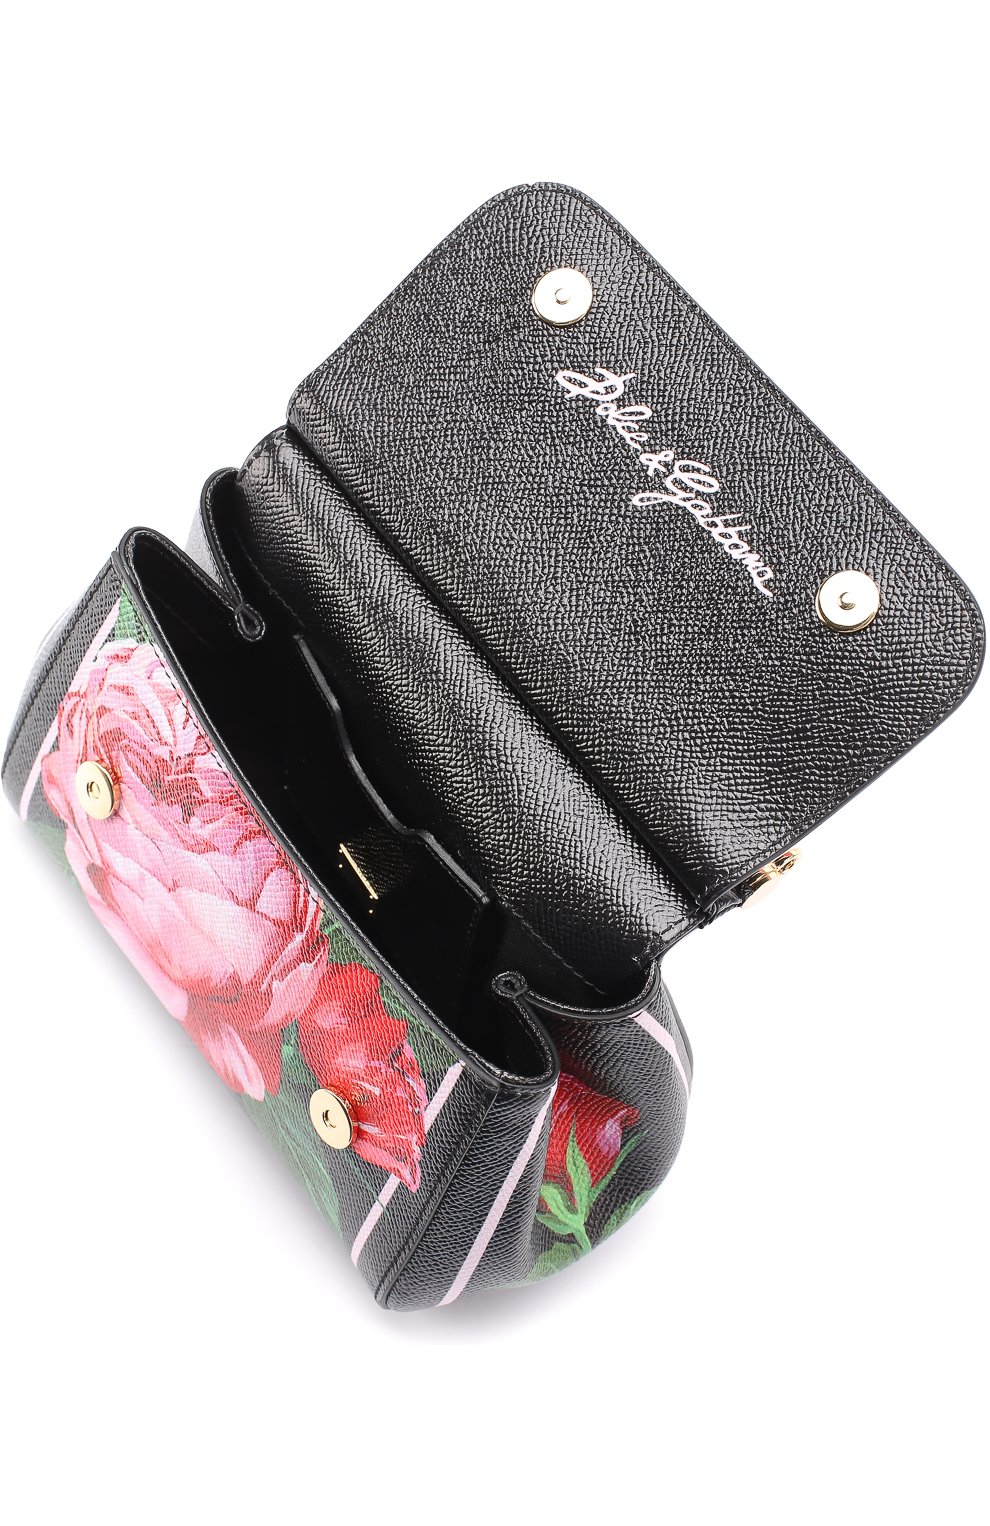 Сумка Sicily micro с принтом Dolce & Gabbana розовая цвета | Фото №4